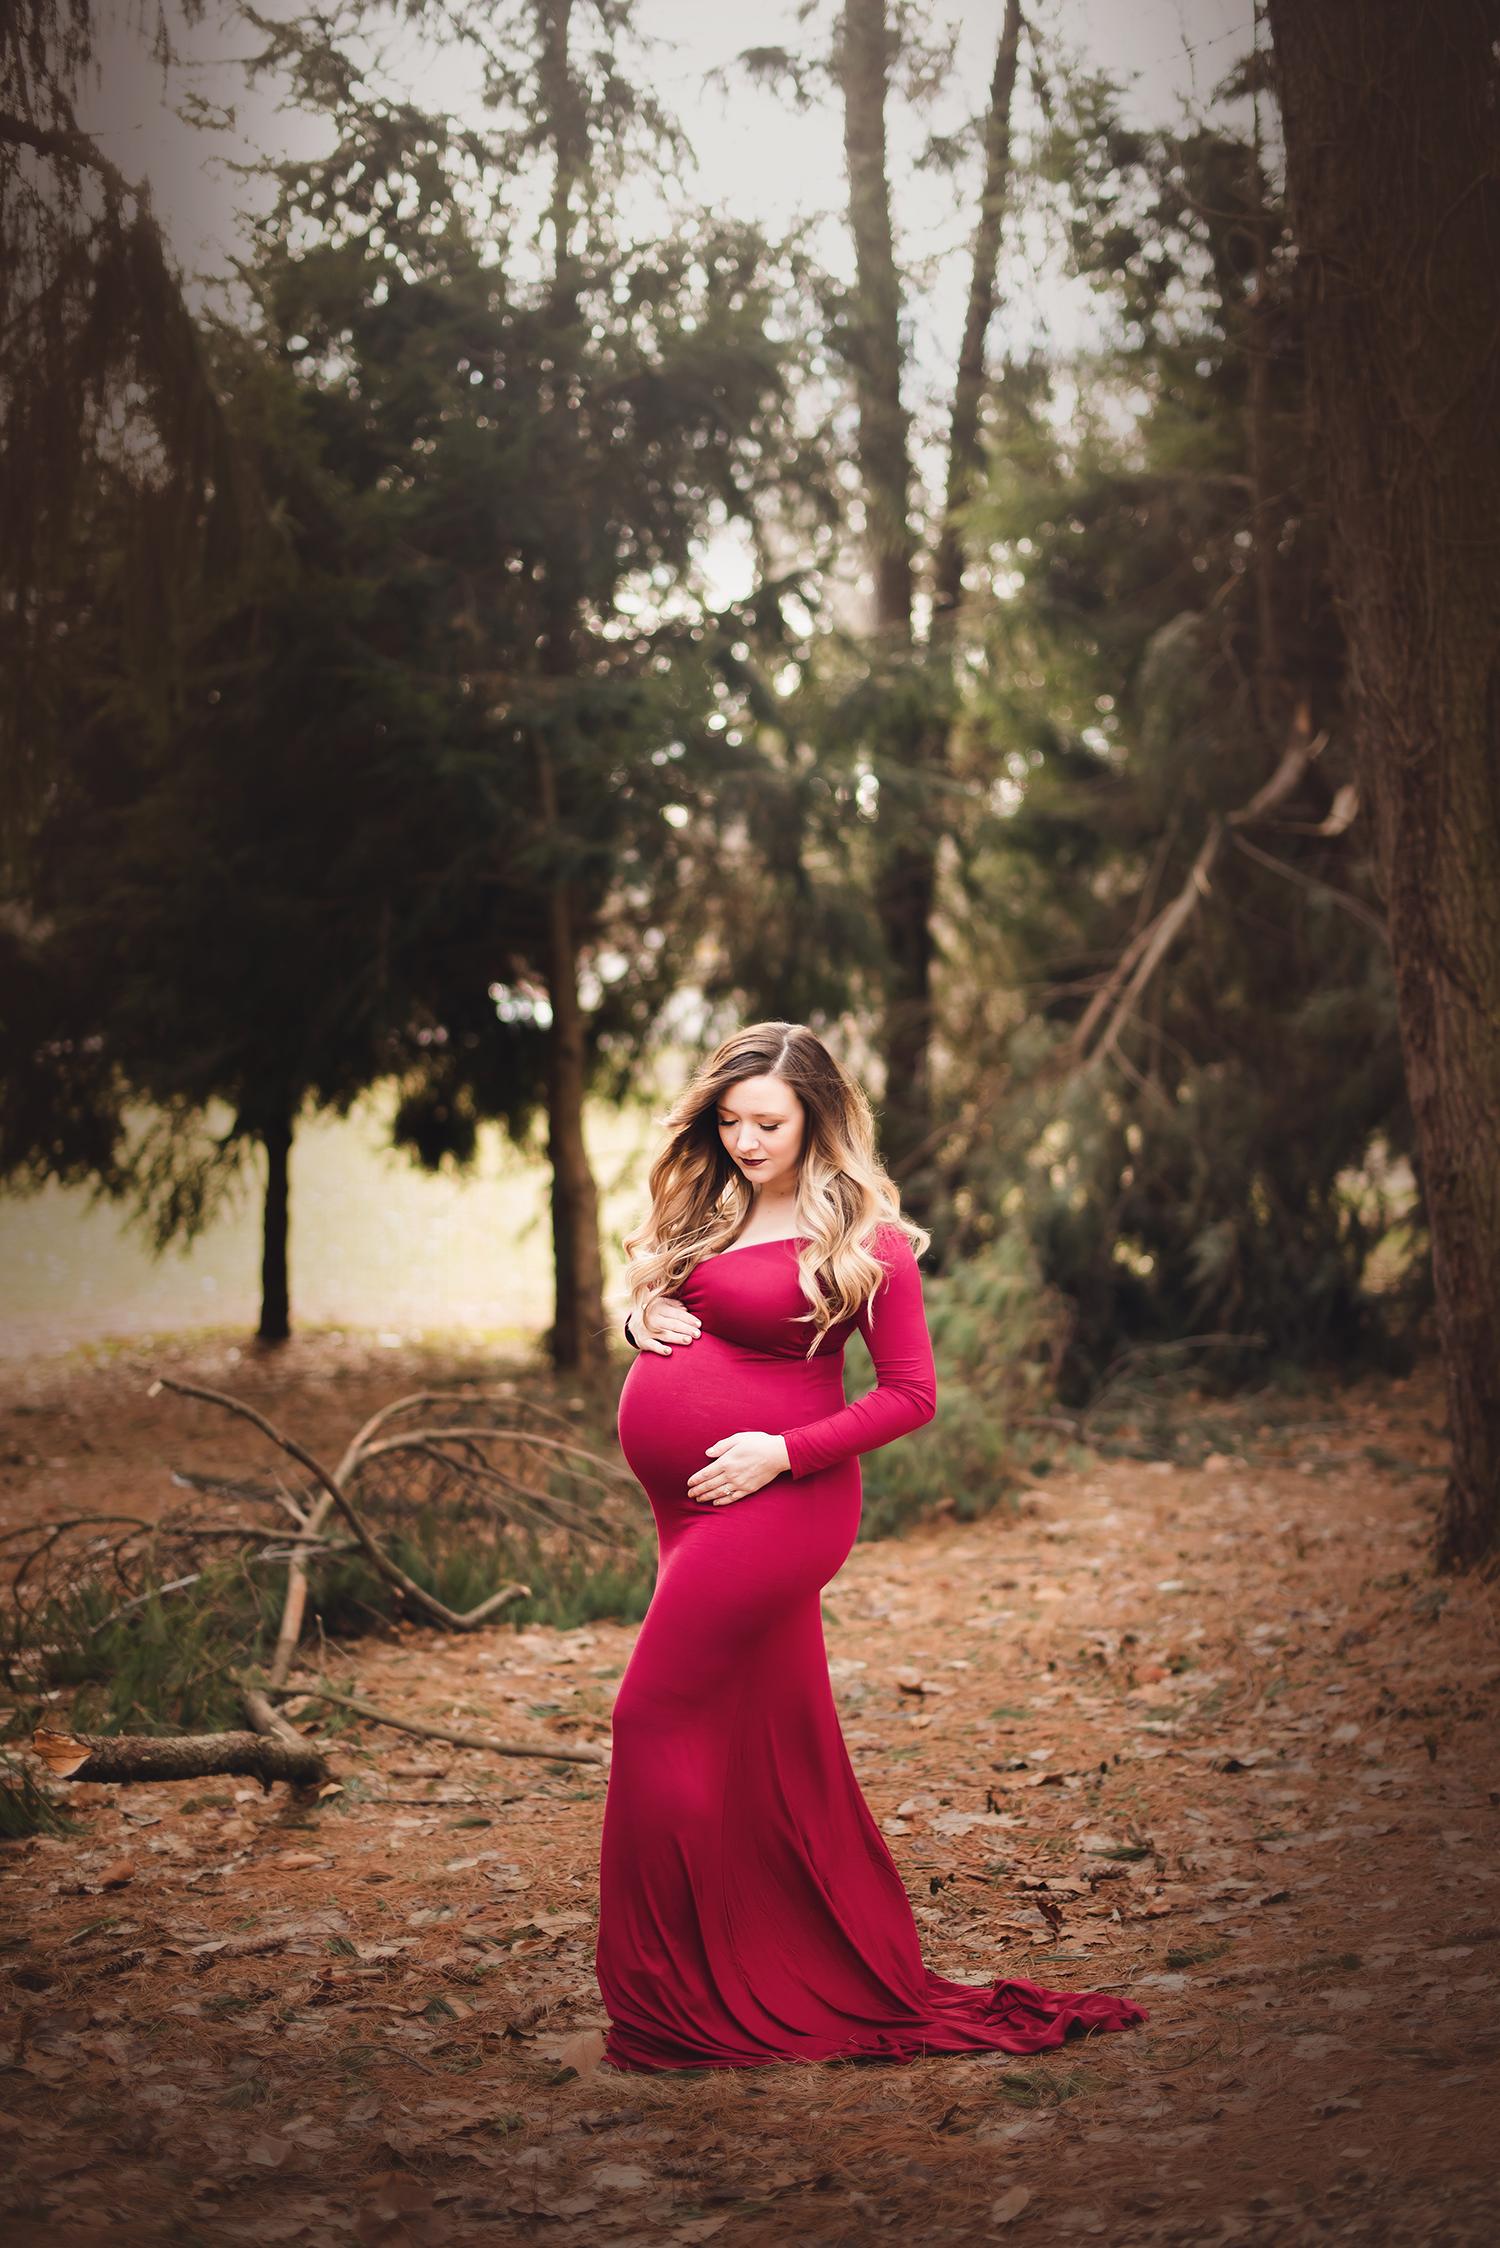 columbus-ohio-maternity-photographer0barebabyphotography.jpg